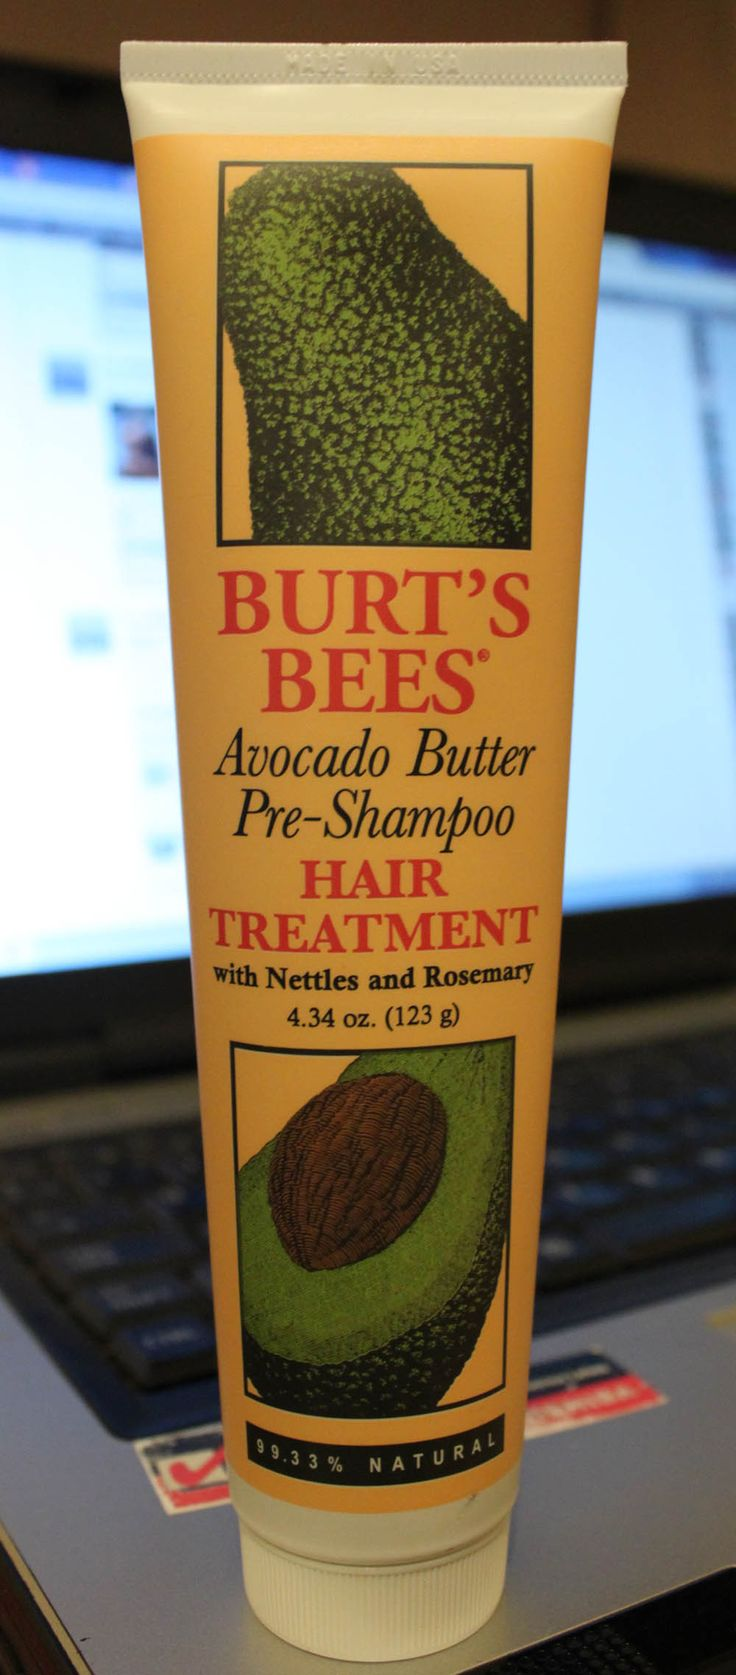 Avocado Butter Pre-Shampoo Hair Treatment de Burt's Bees